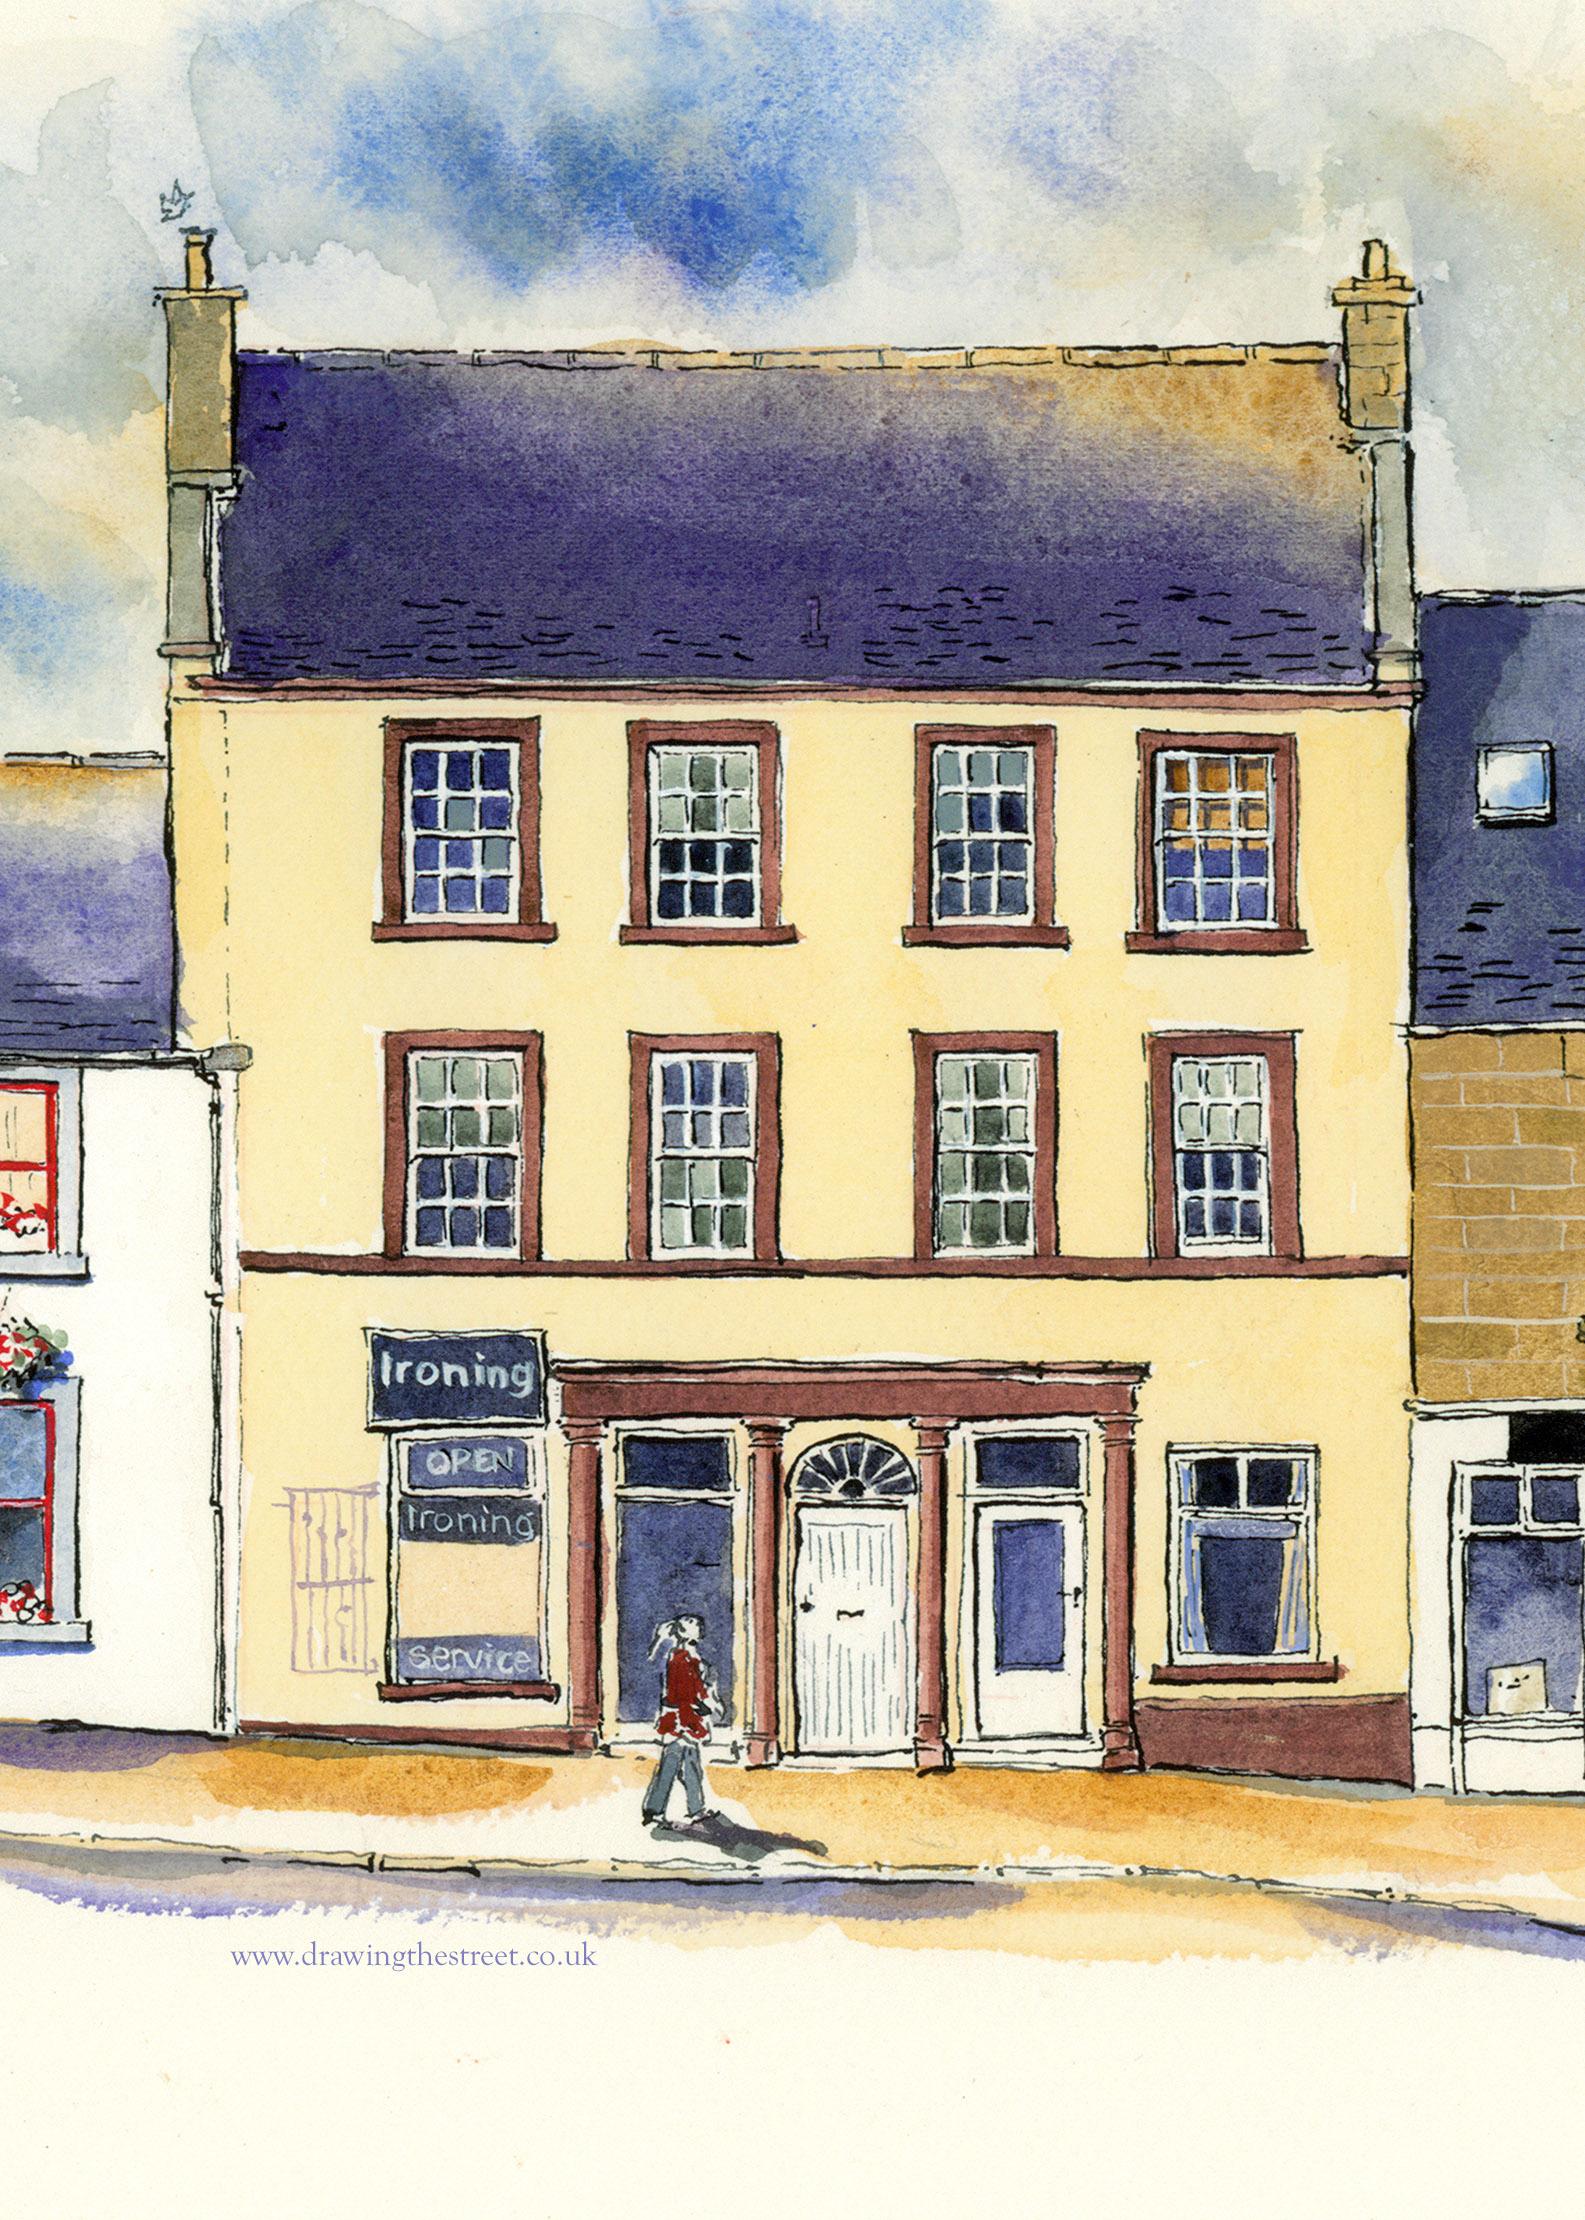 no 9, 11 and 13 west port lanark, artwork by ronnie cruwys